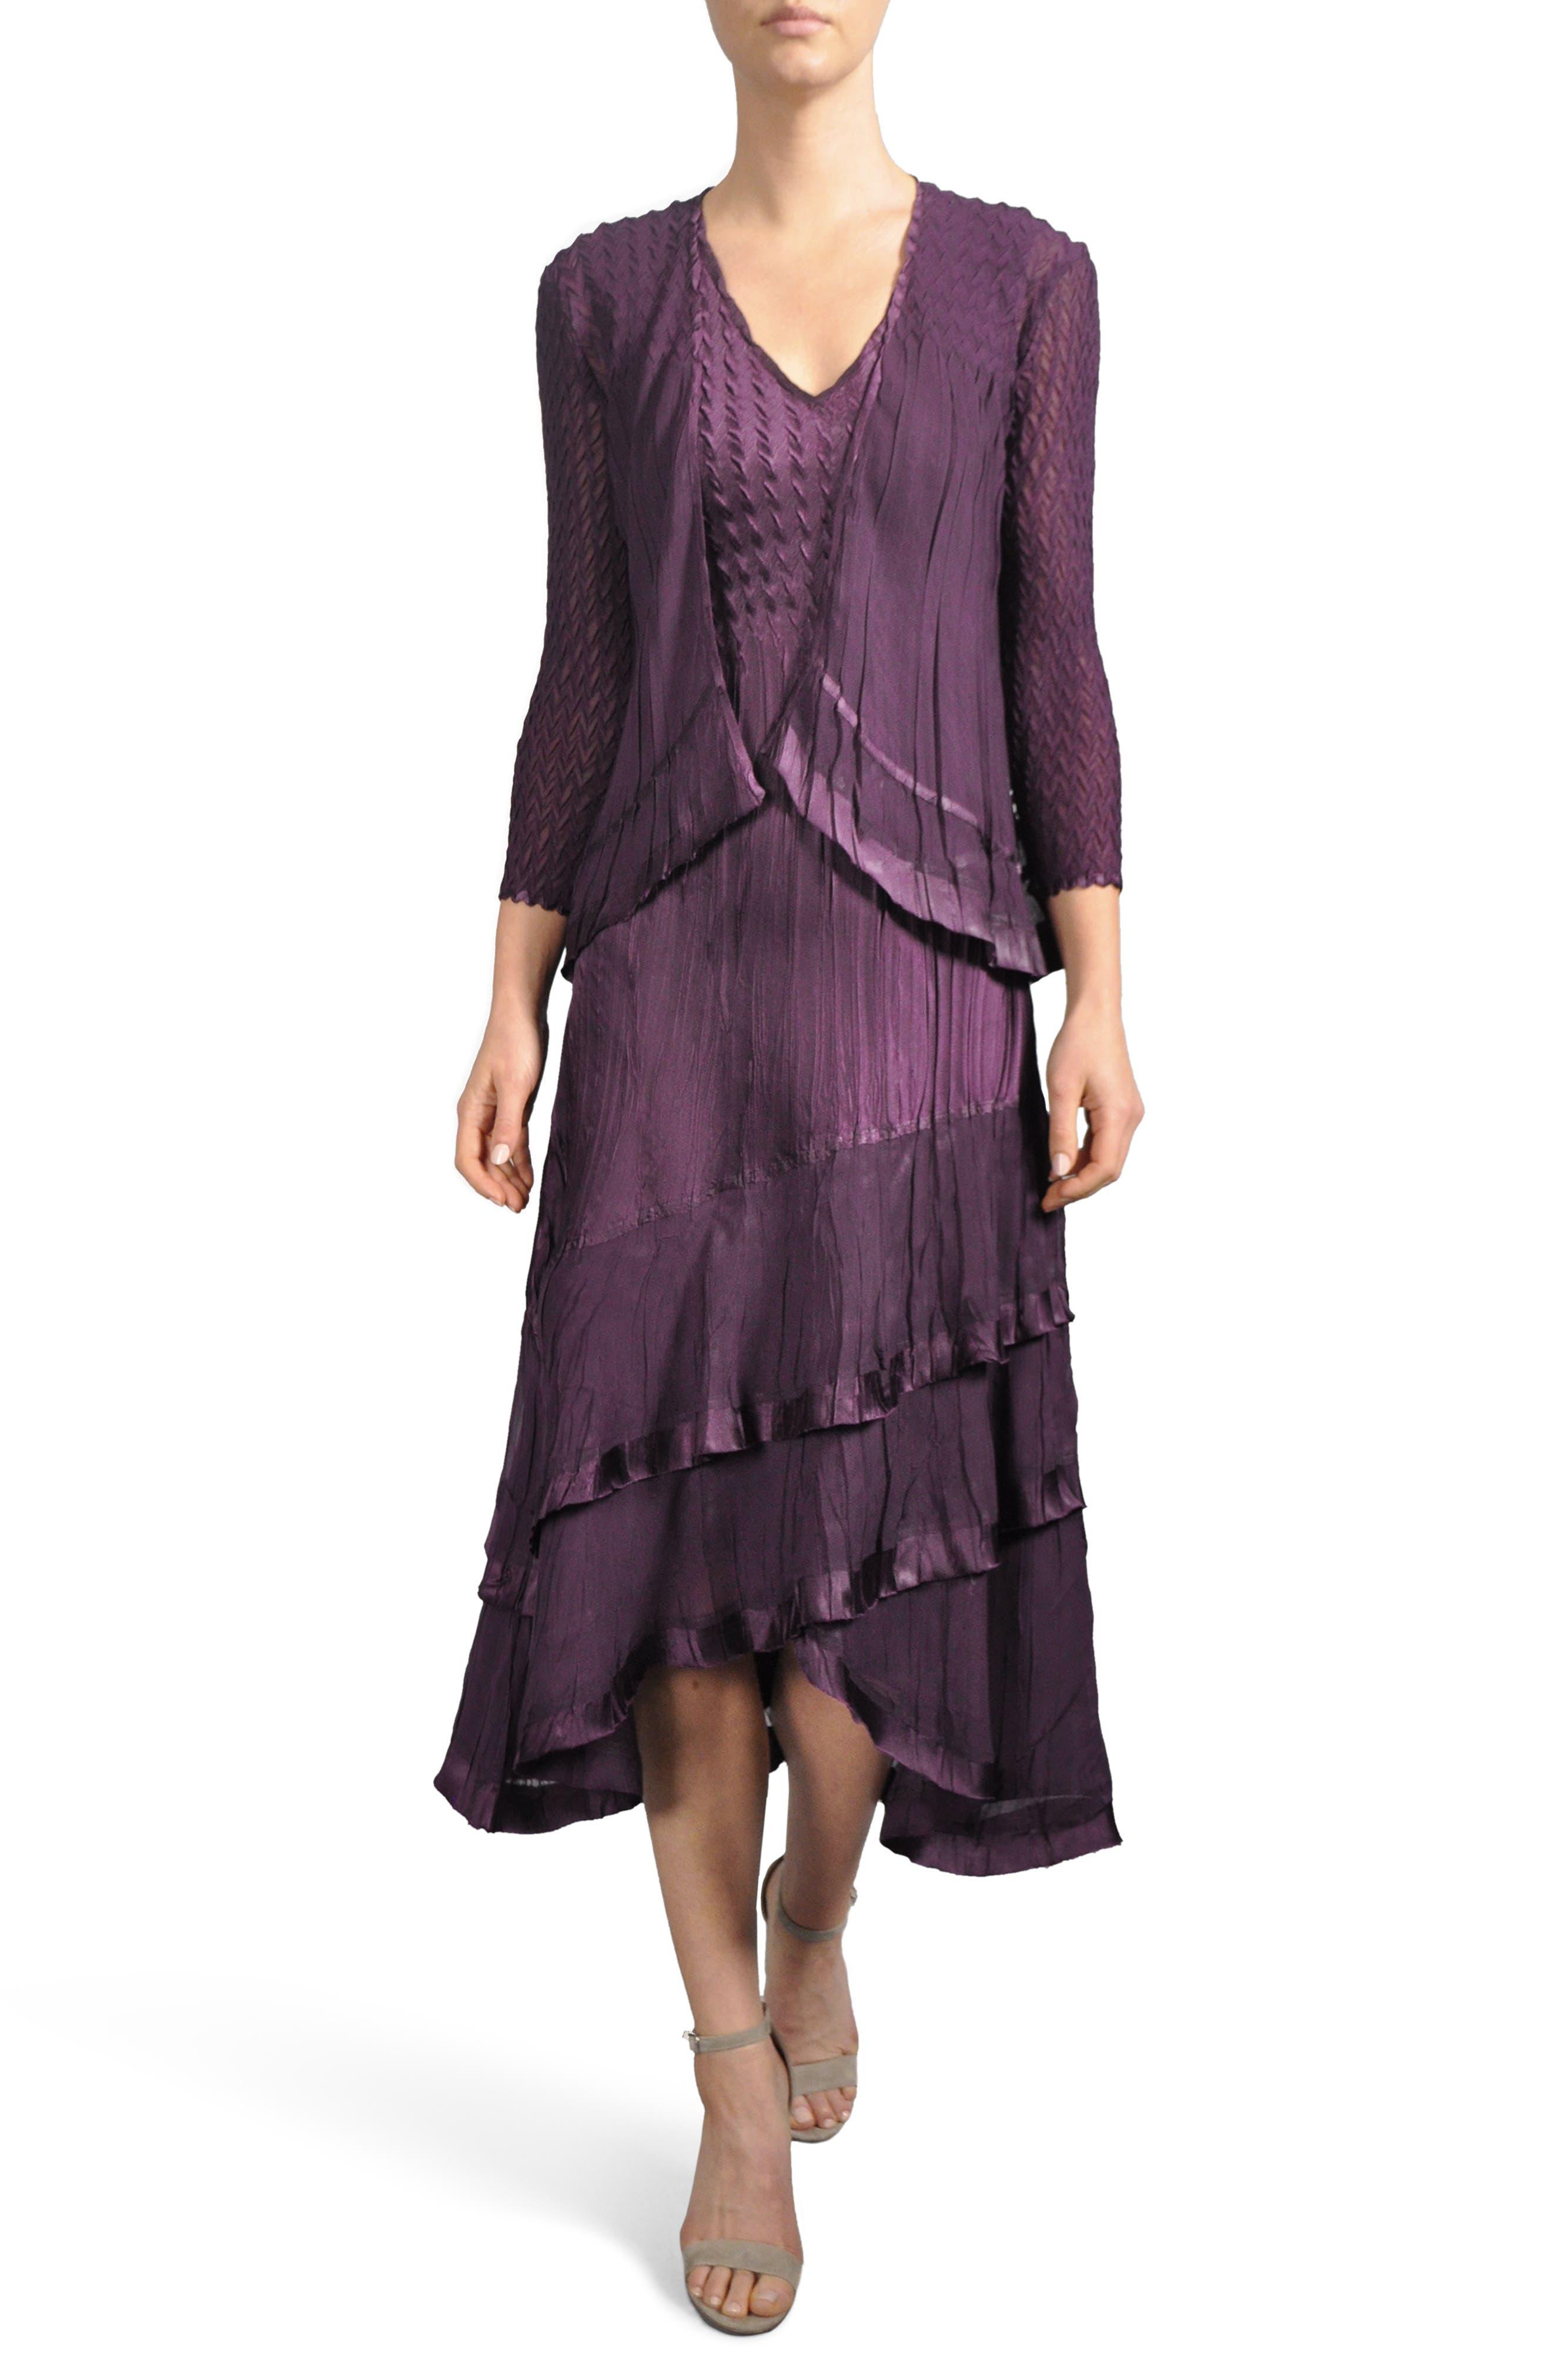 Komorov Textured Tiered Midi Dress with Jacket,                         Main,                         color, Aubergine